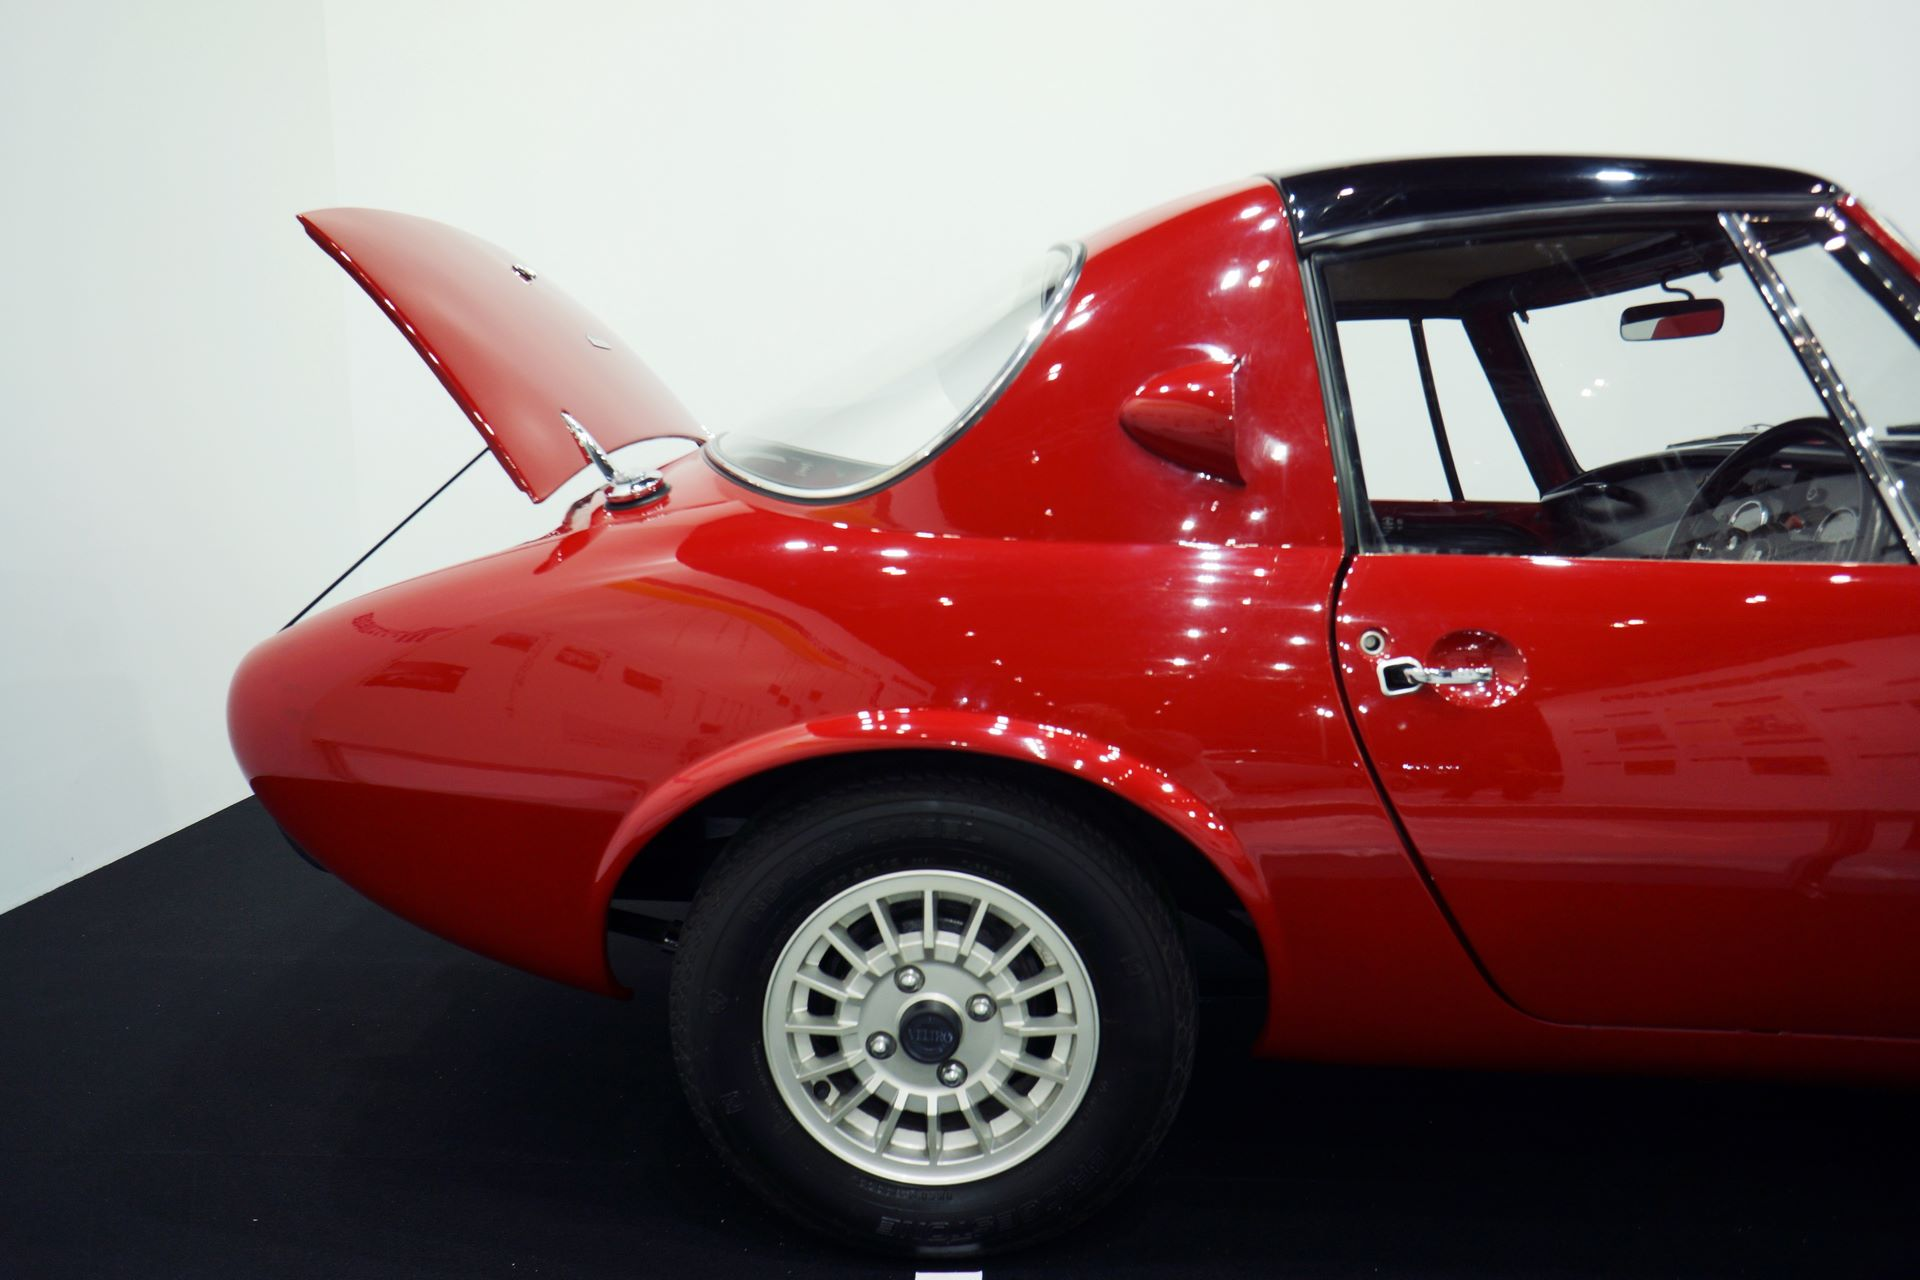 Toyota-Sports-800-Gas-Turbine-Hybrid-concept-1977-10